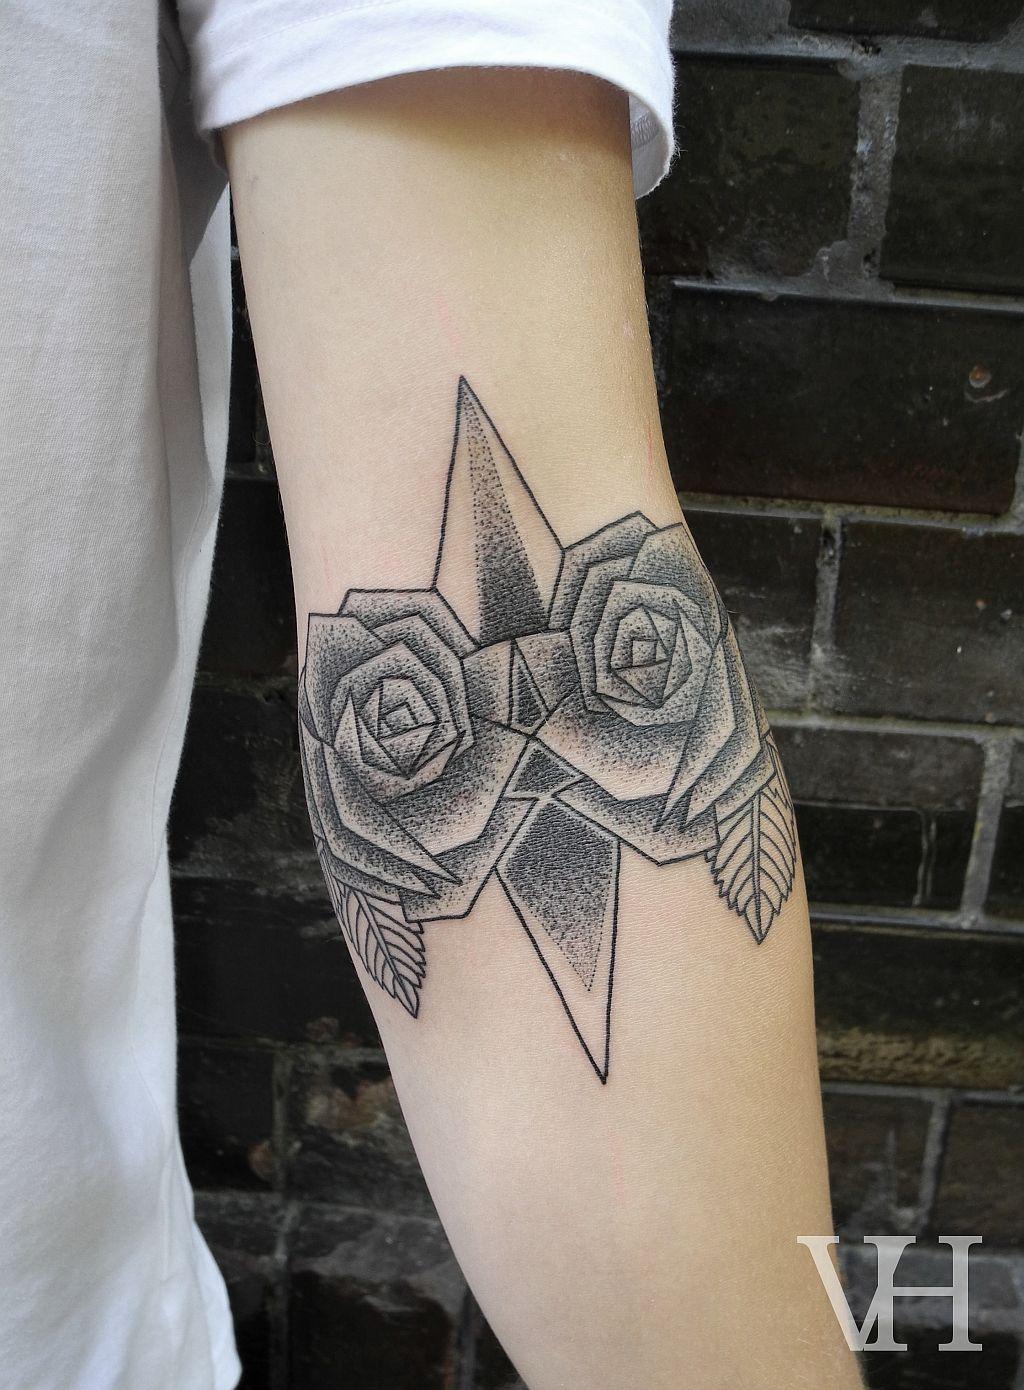 VH Tattoo  INKspiration Pinterest